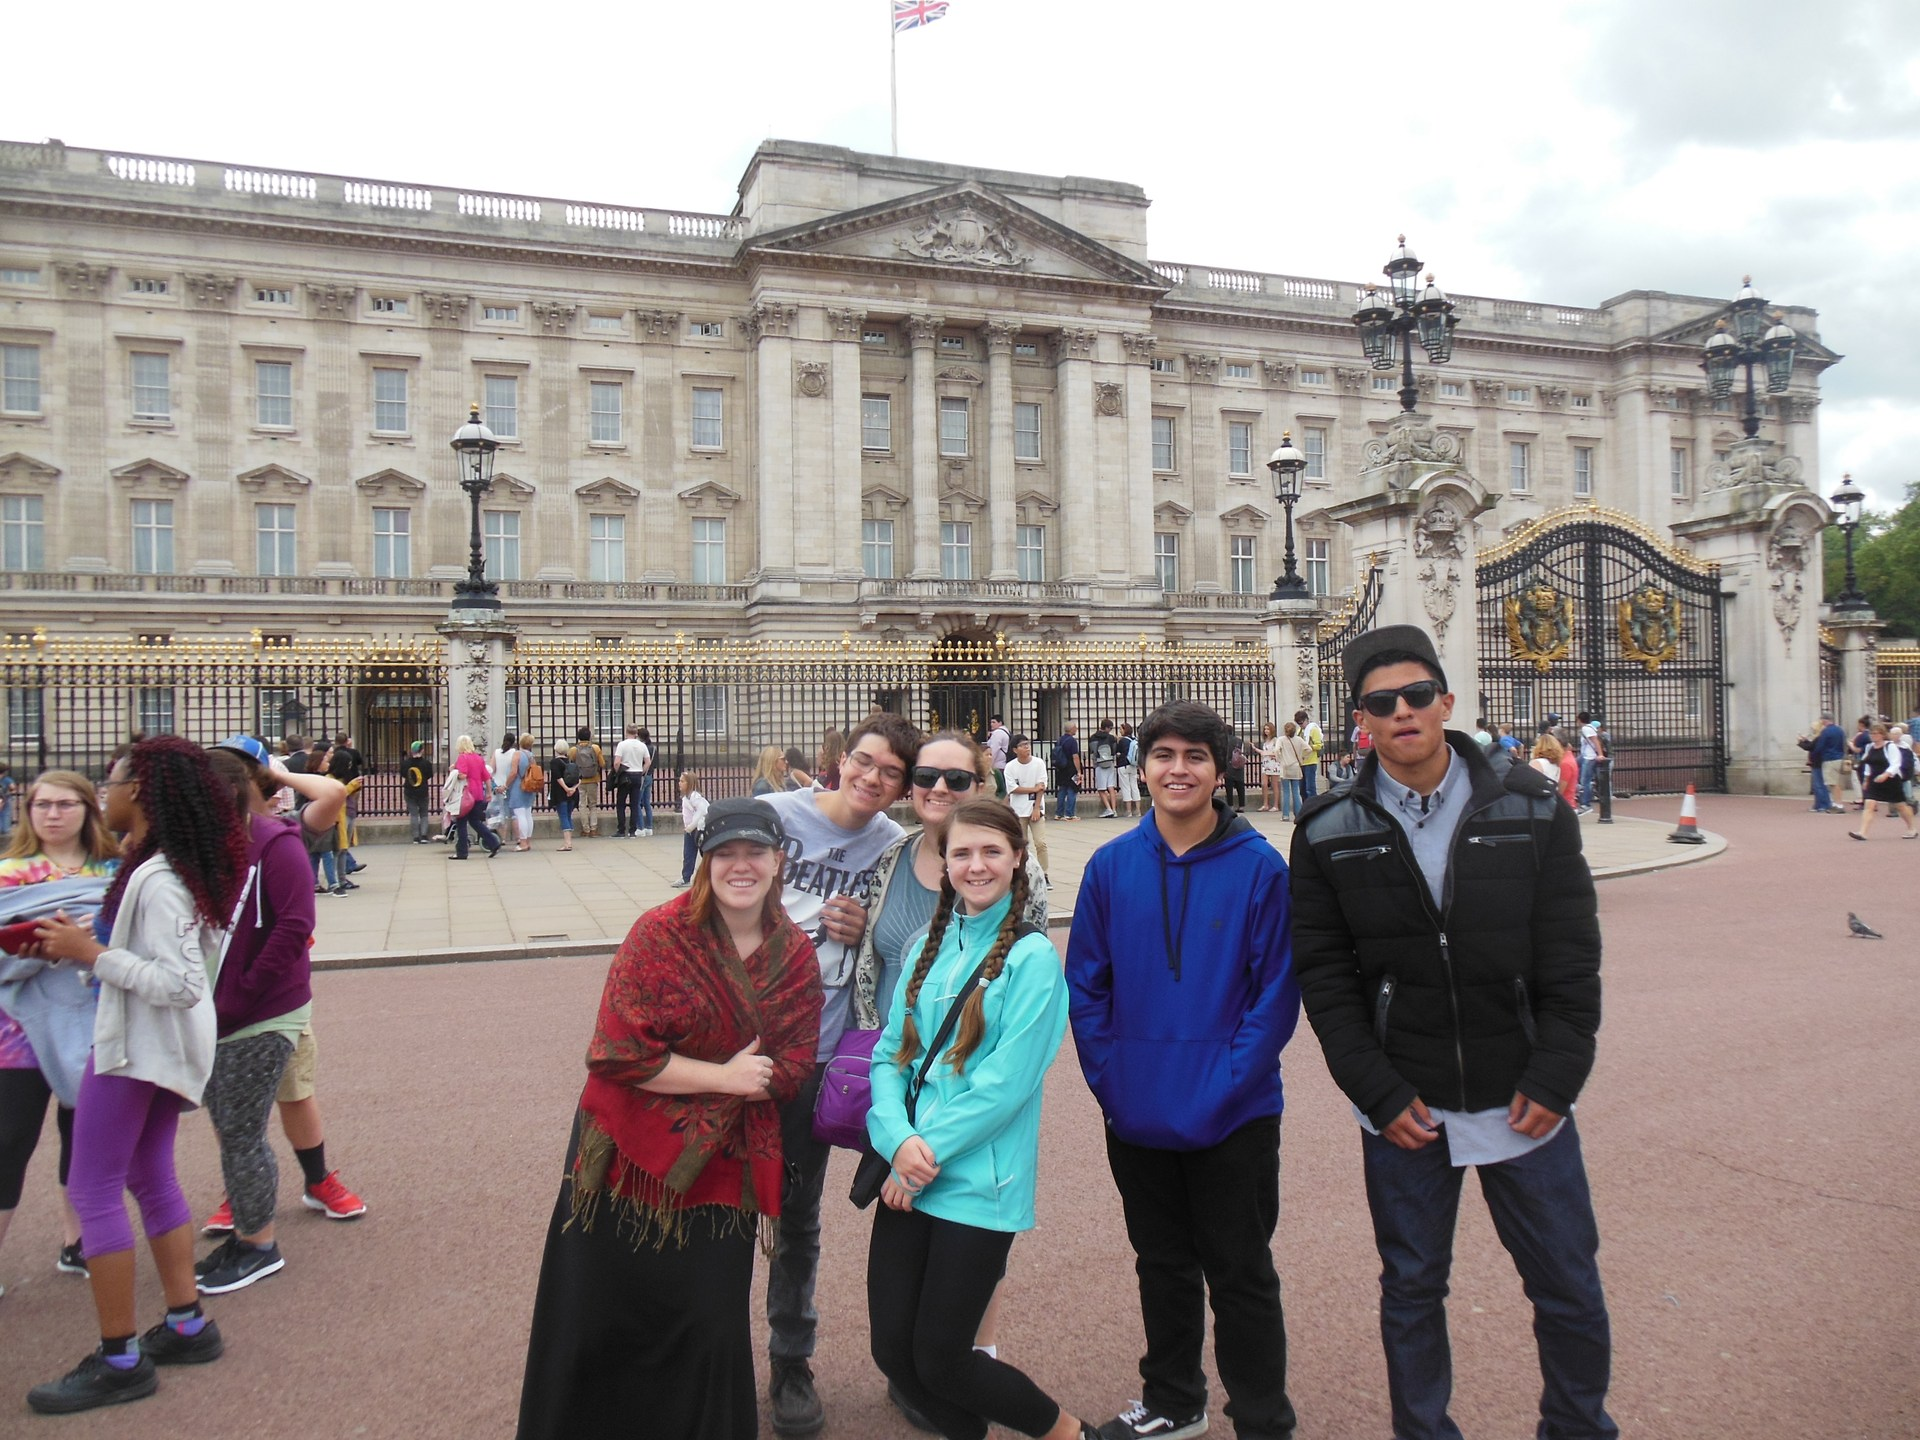 At Buckingham Palace